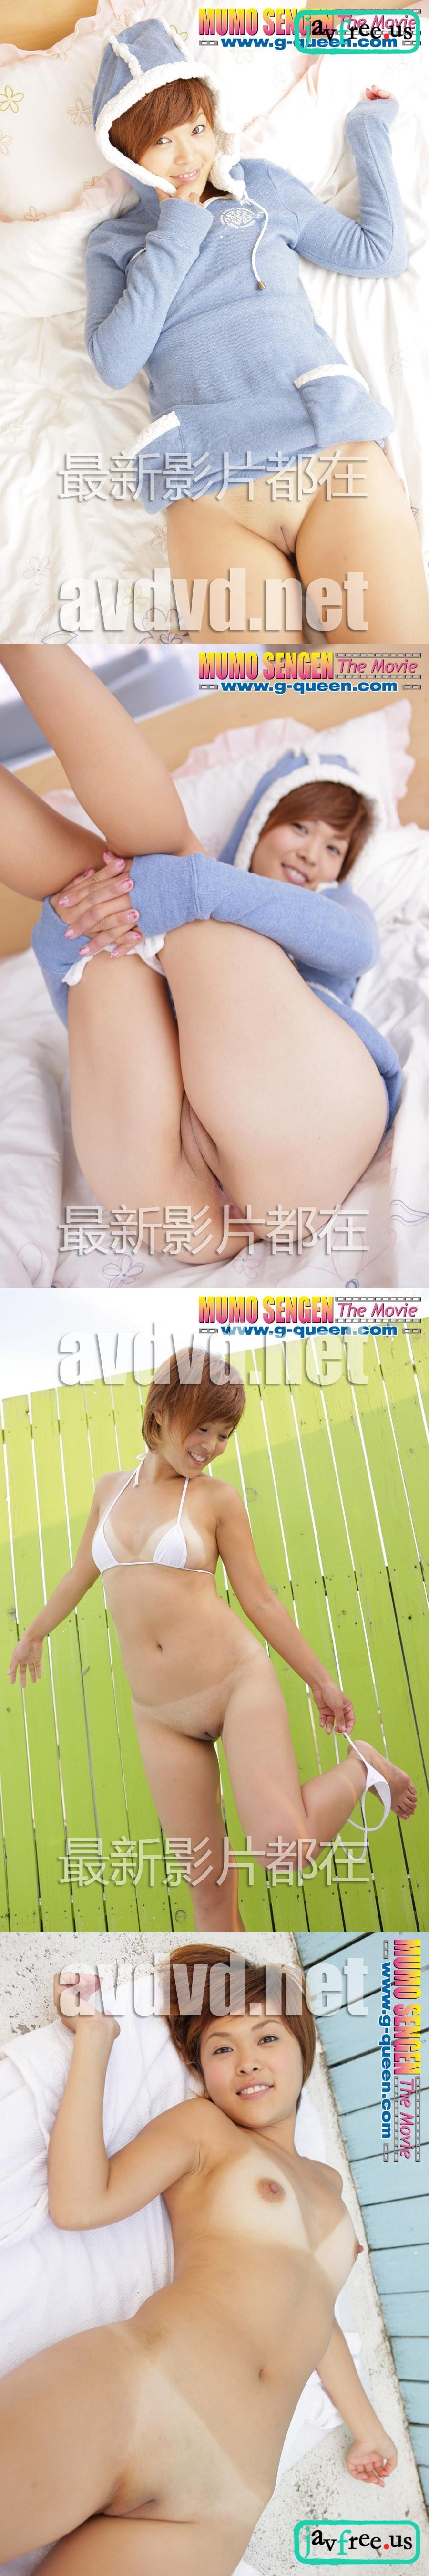 G-Queen.com 無毛宣言 295 <Flauta> 片倉愛美 Emi Katakura - image g-queen-295 on https://javfree.me